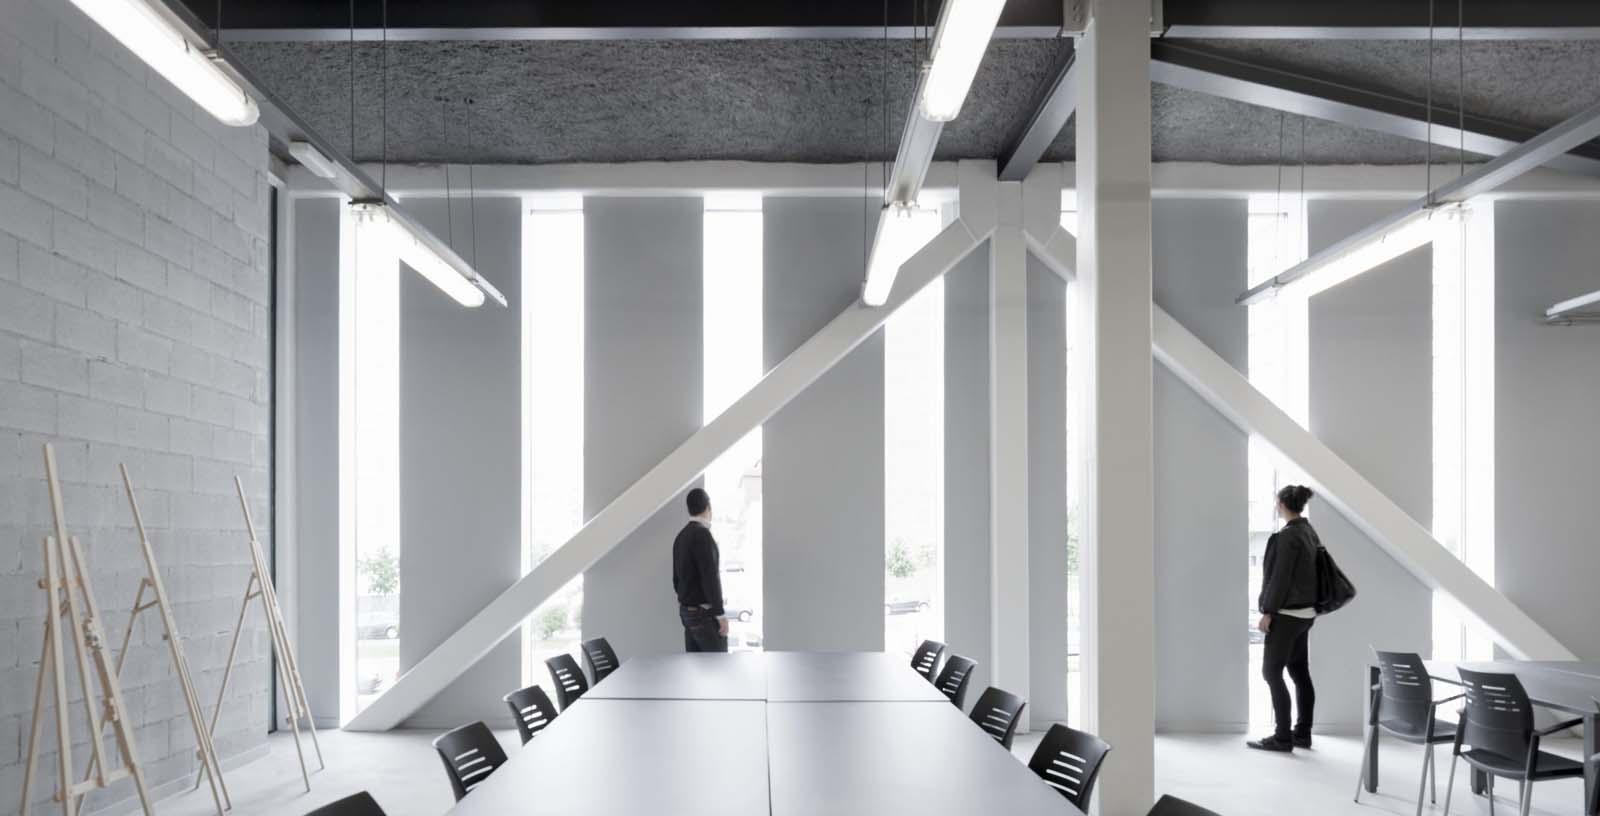 Salburua_Civic_Centre_04_Architecture_IDOM_photo_Aitor_Ortiz